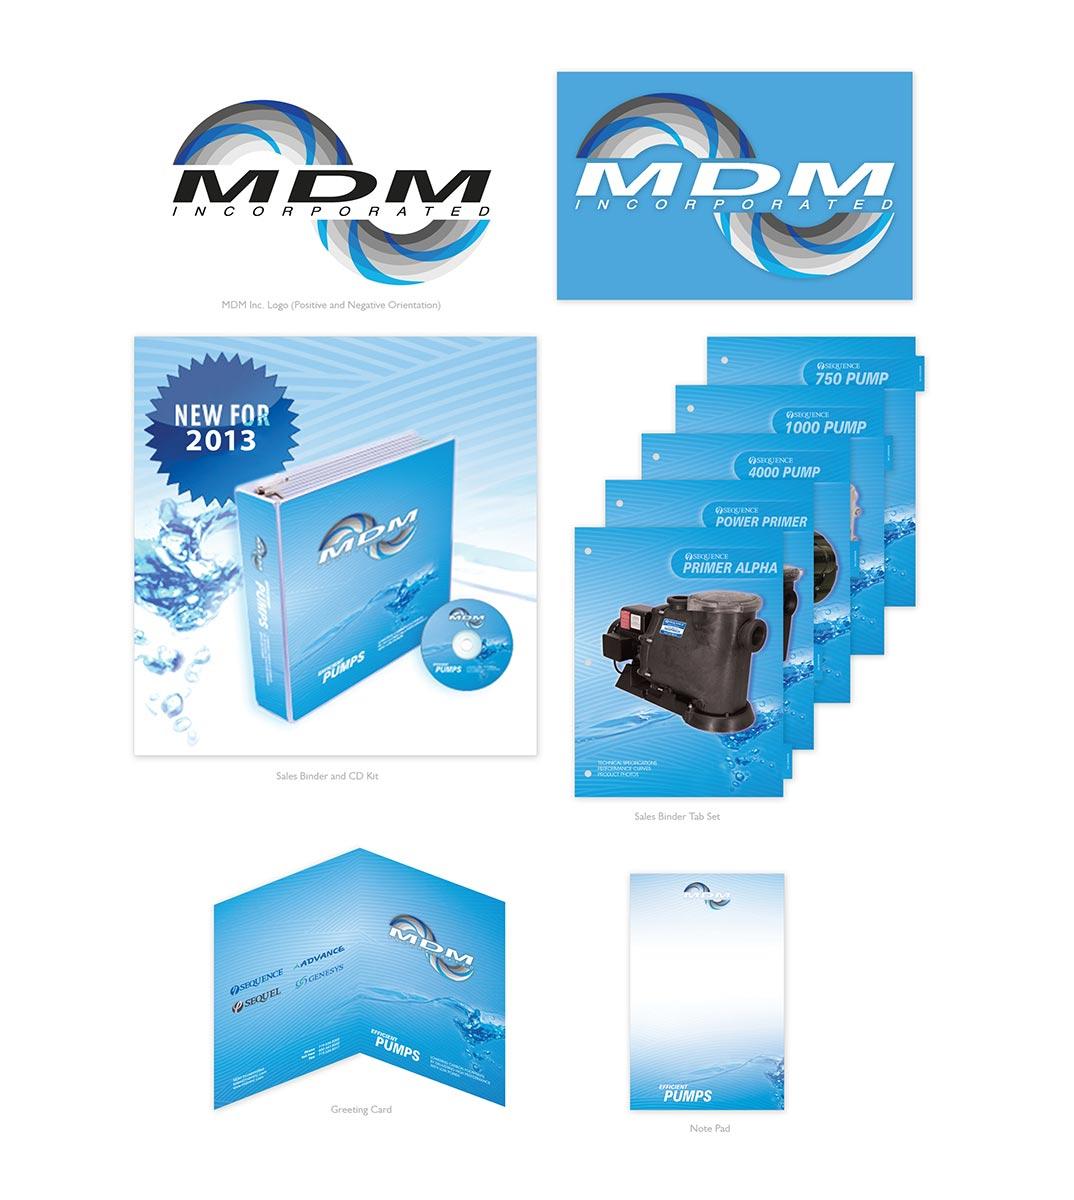 MDM Branding Study